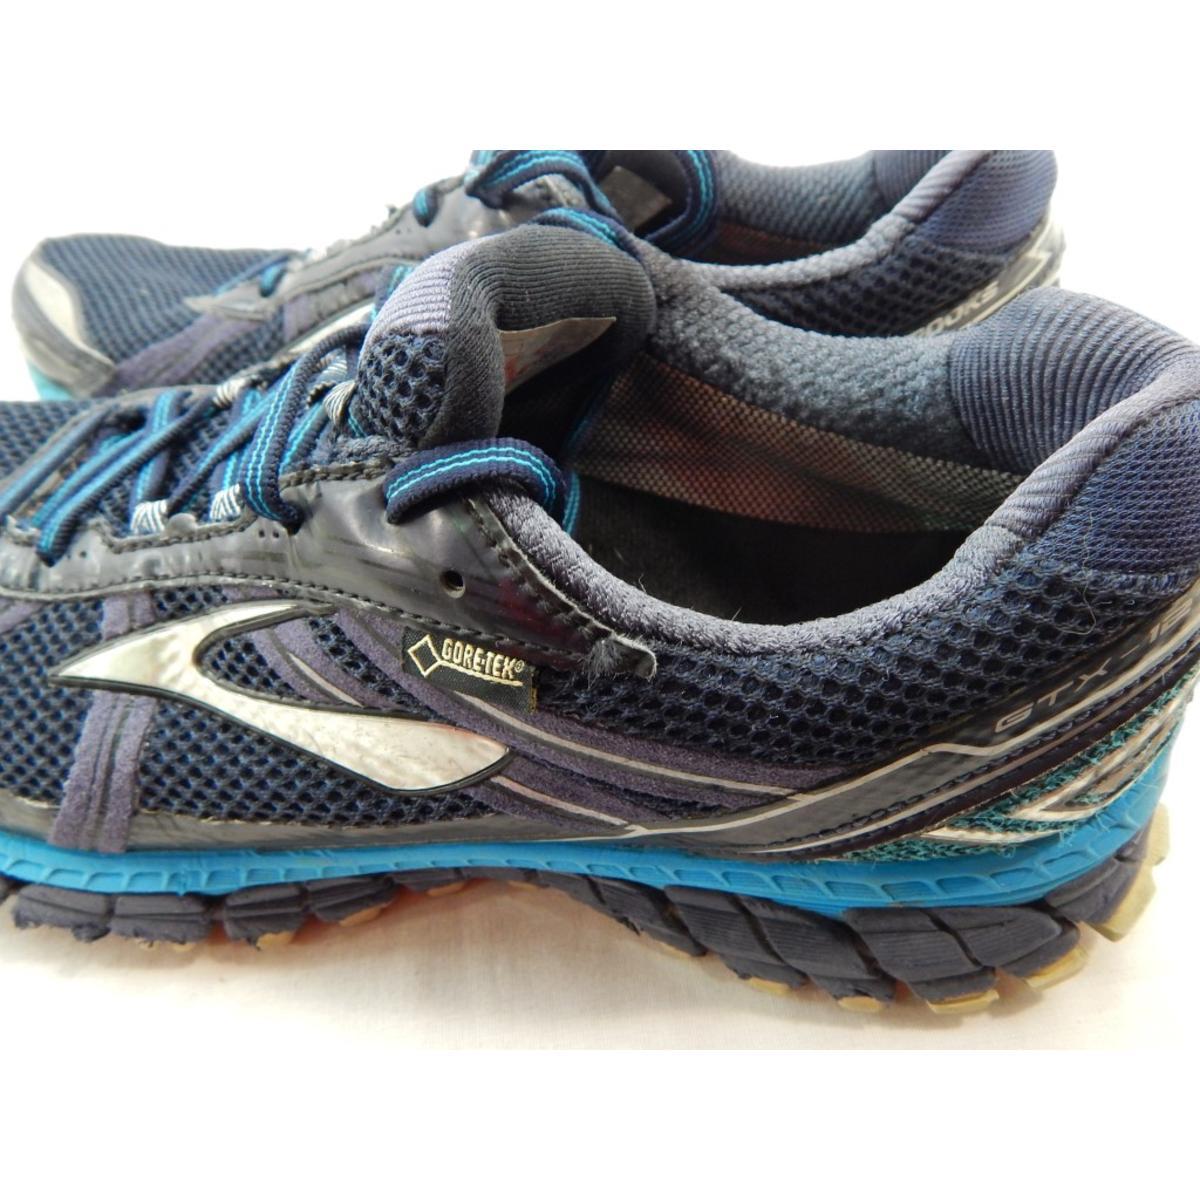 c5311651adcbb Brooks Adrenaline ASR 12 GTX Men s Peacoat Atomic Blue Running Shoe 10.5M 5  5 of 6 ...